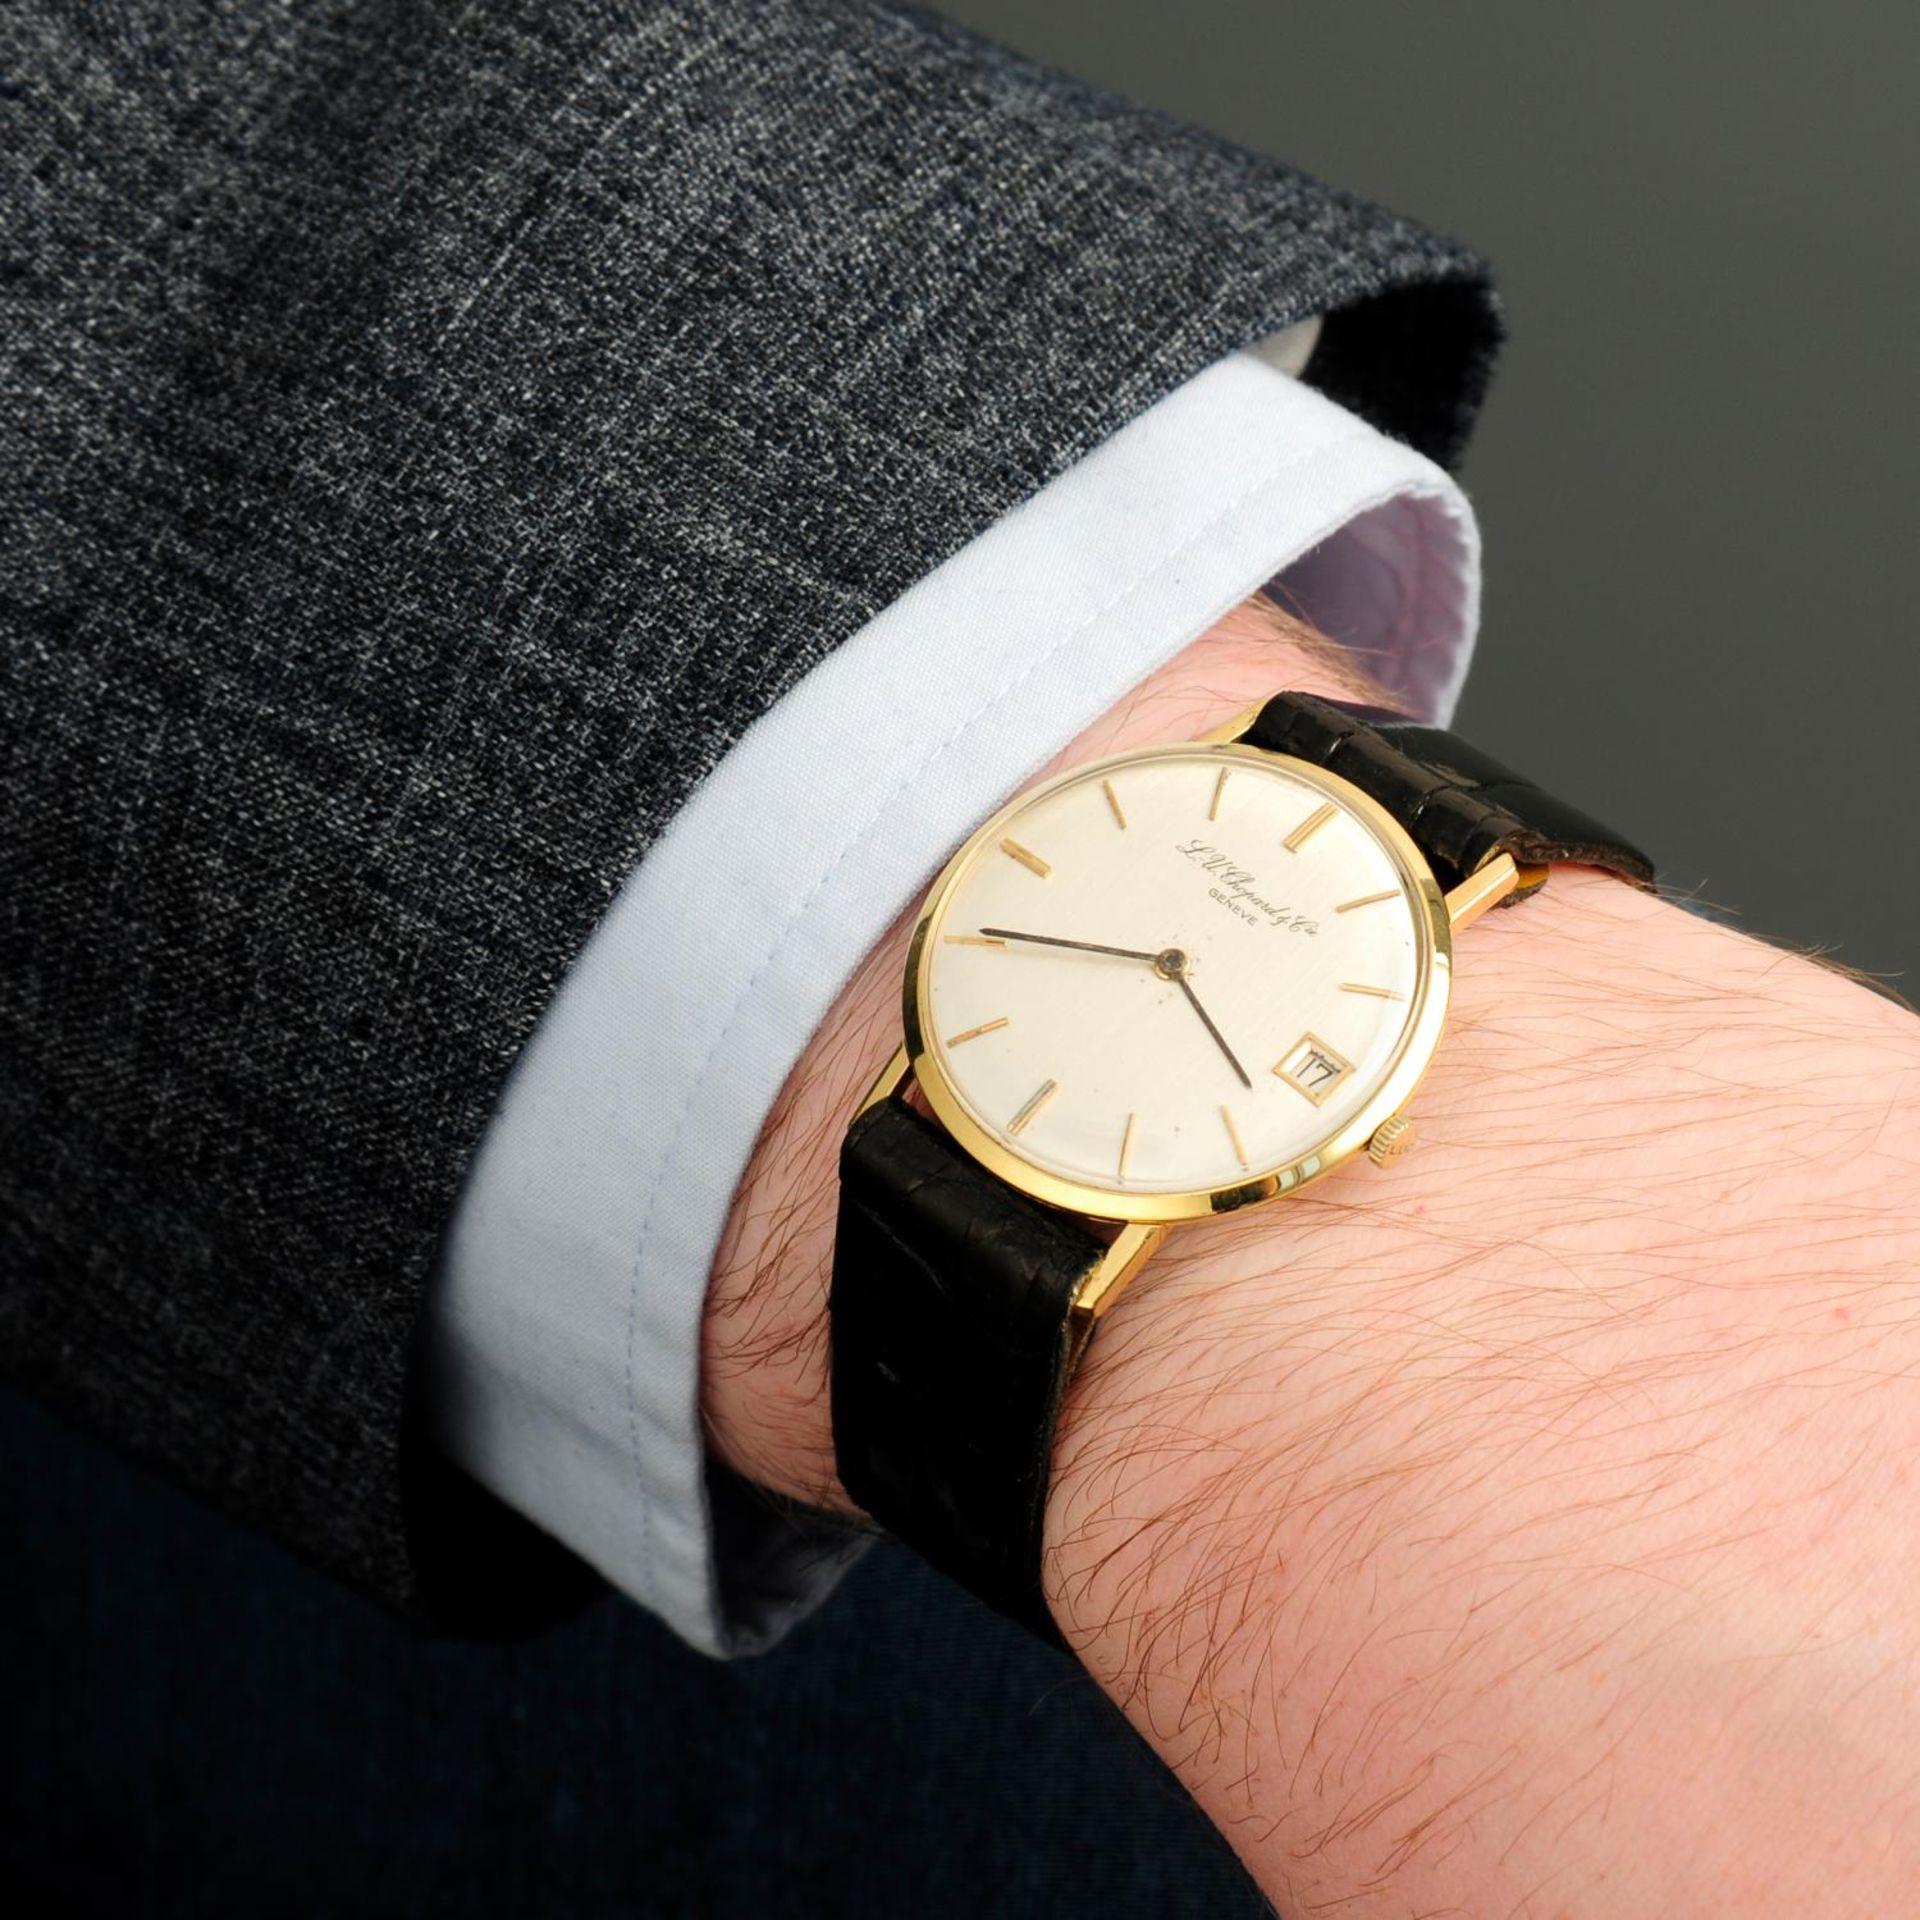 CHOPARD - a wrist watch. - Bild 3 aus 5